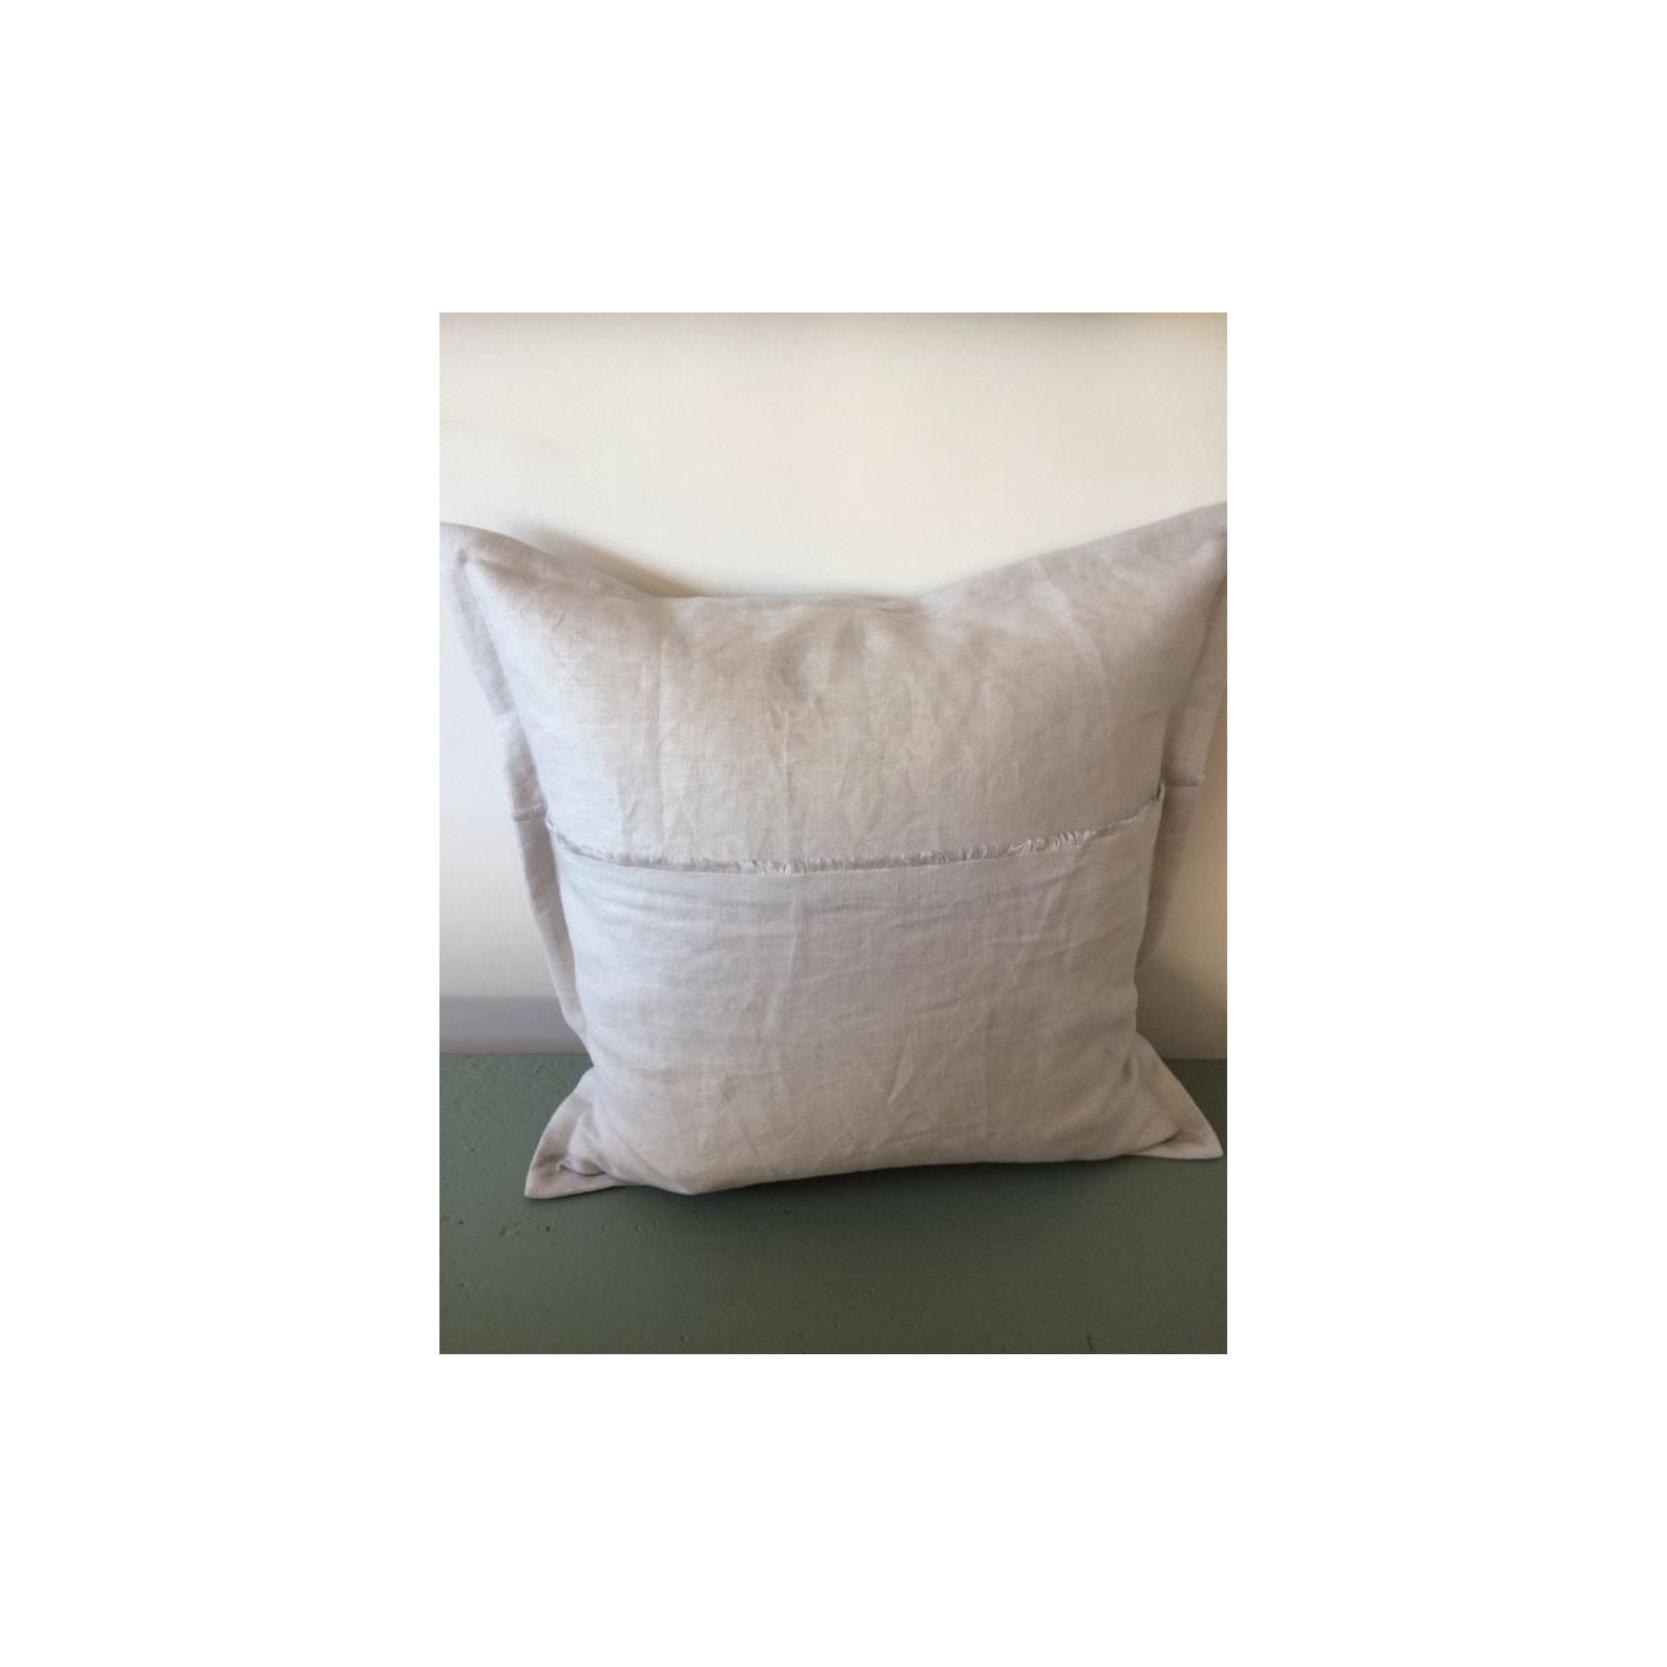 Pebble & Stripe - Square pale grey cushion